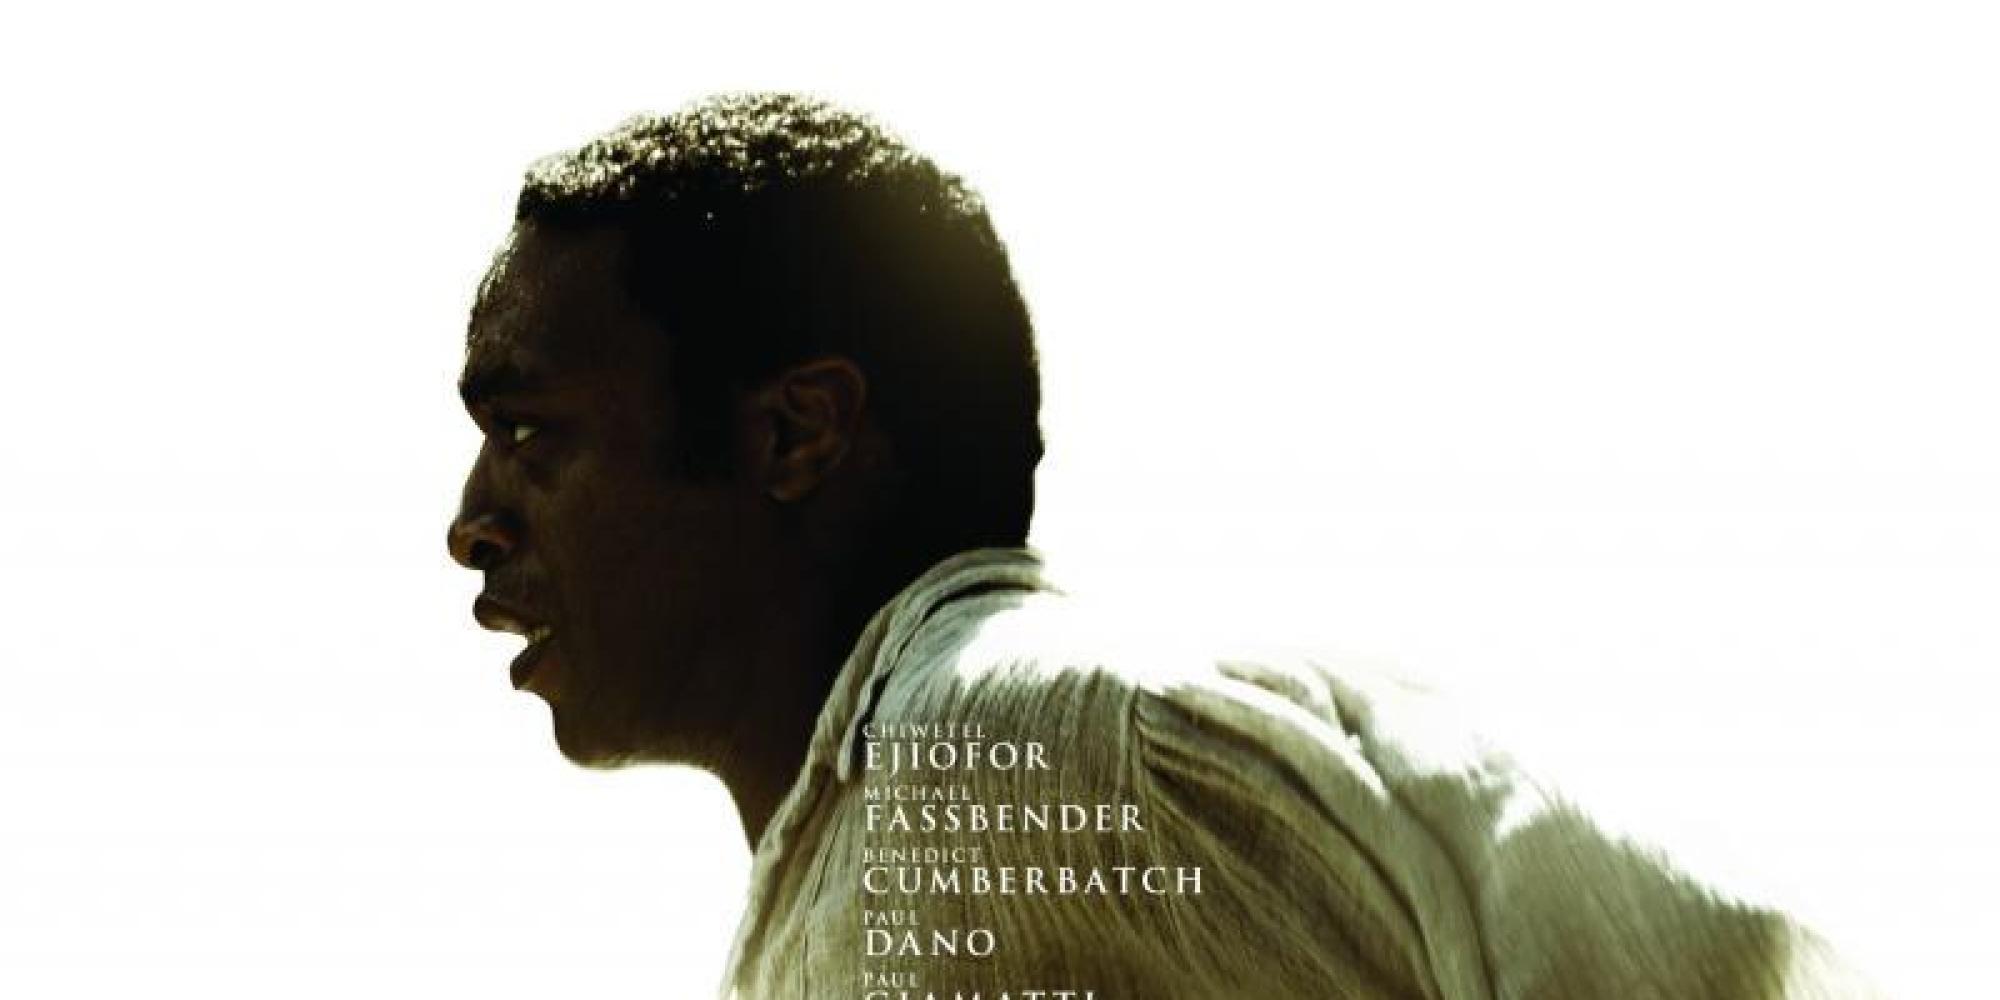 12 years a slave brad pitt fassbender steve mcqueen imdb slavery free black man wiki